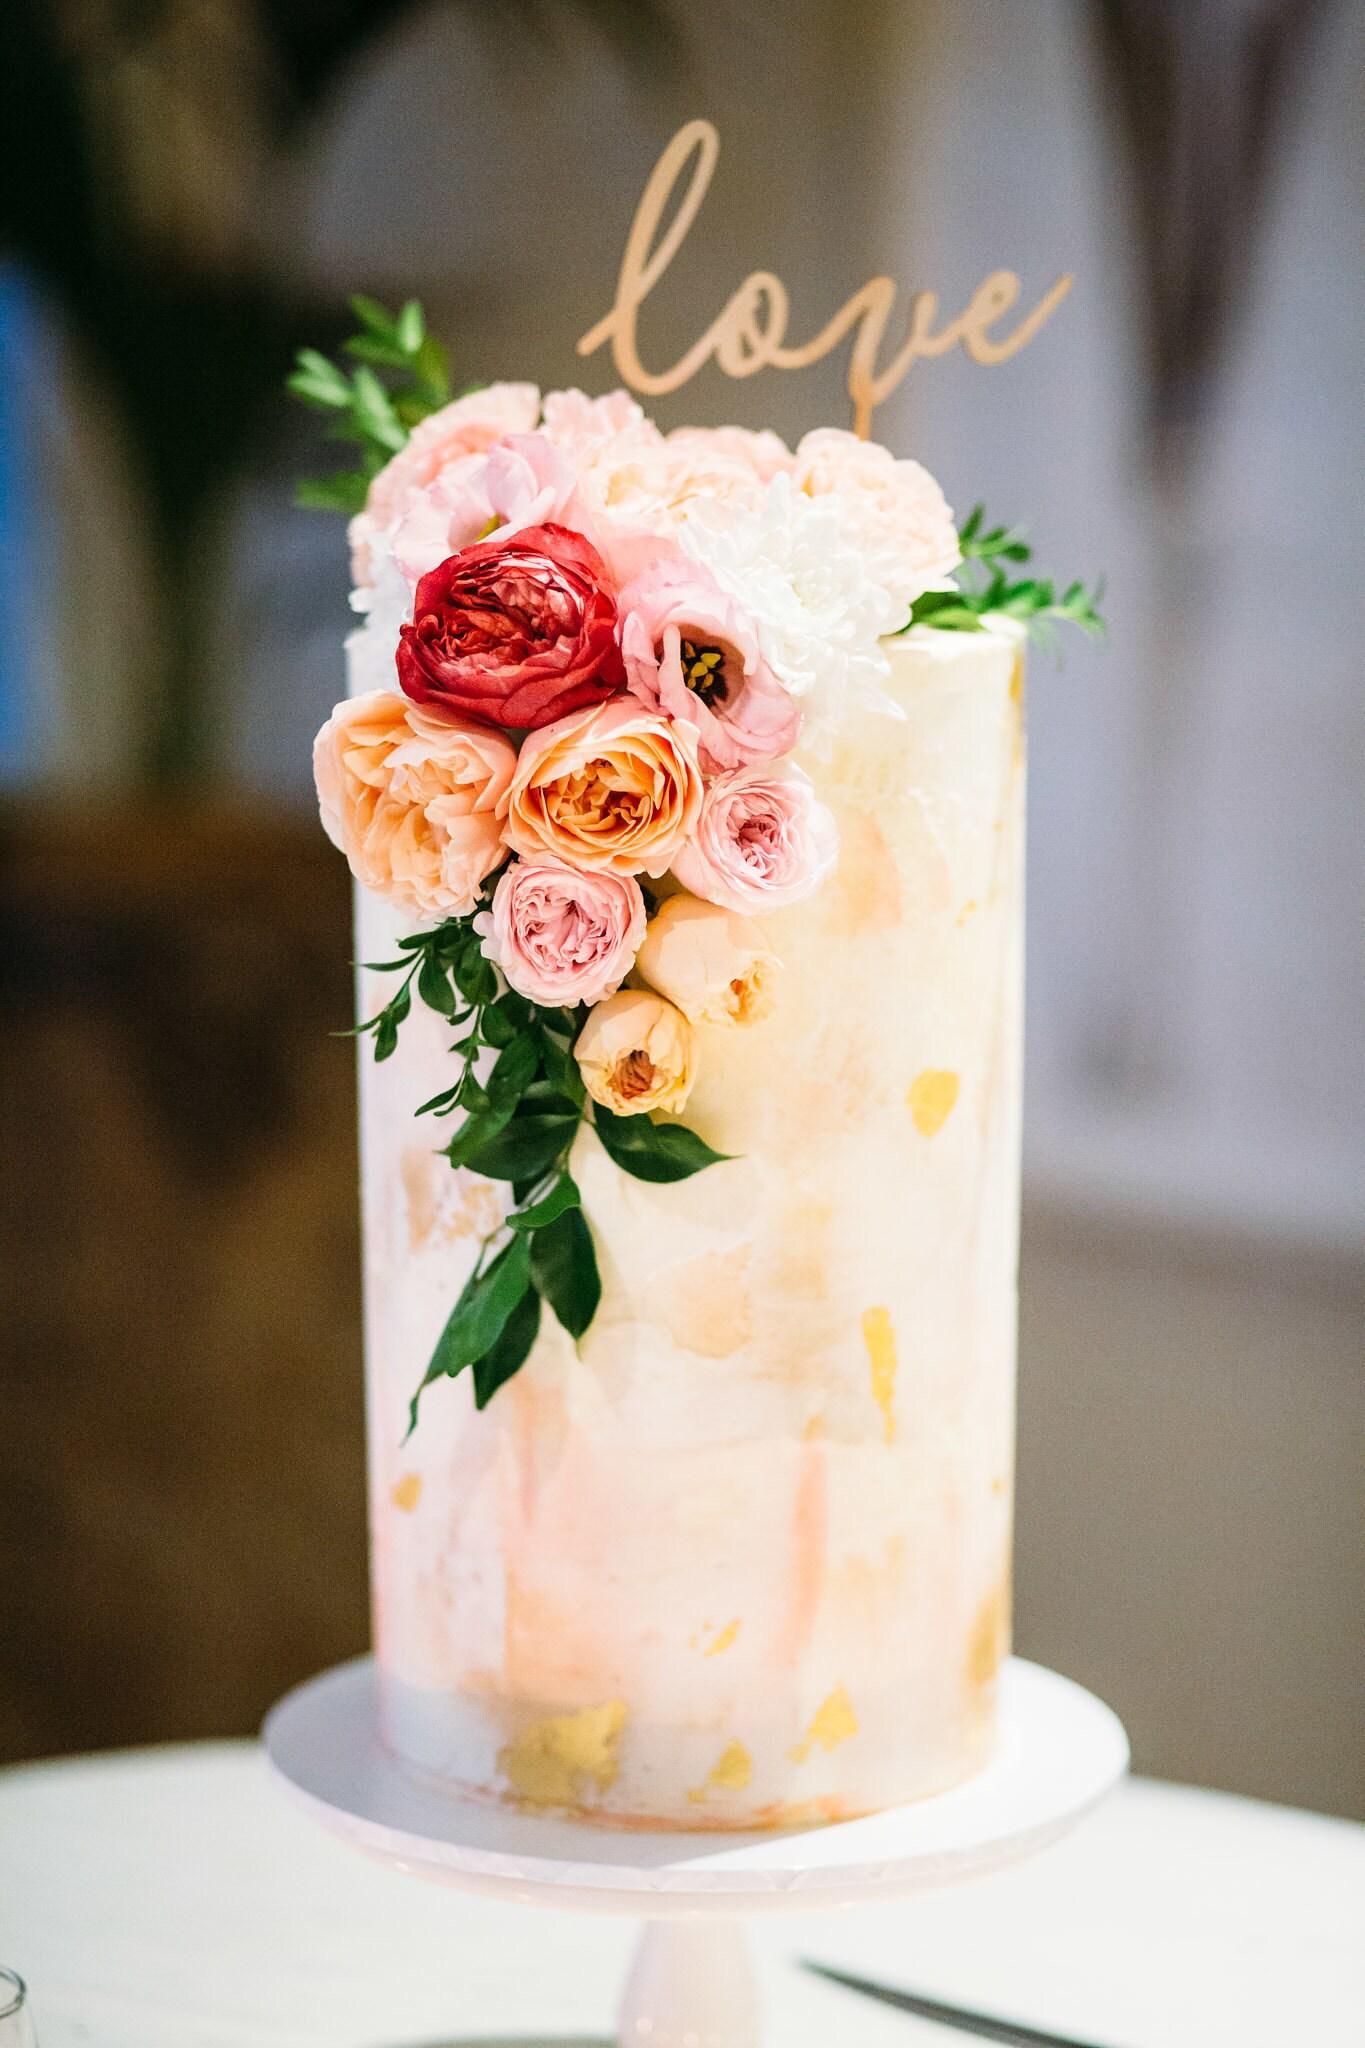 Wedding cake - Love cake topper